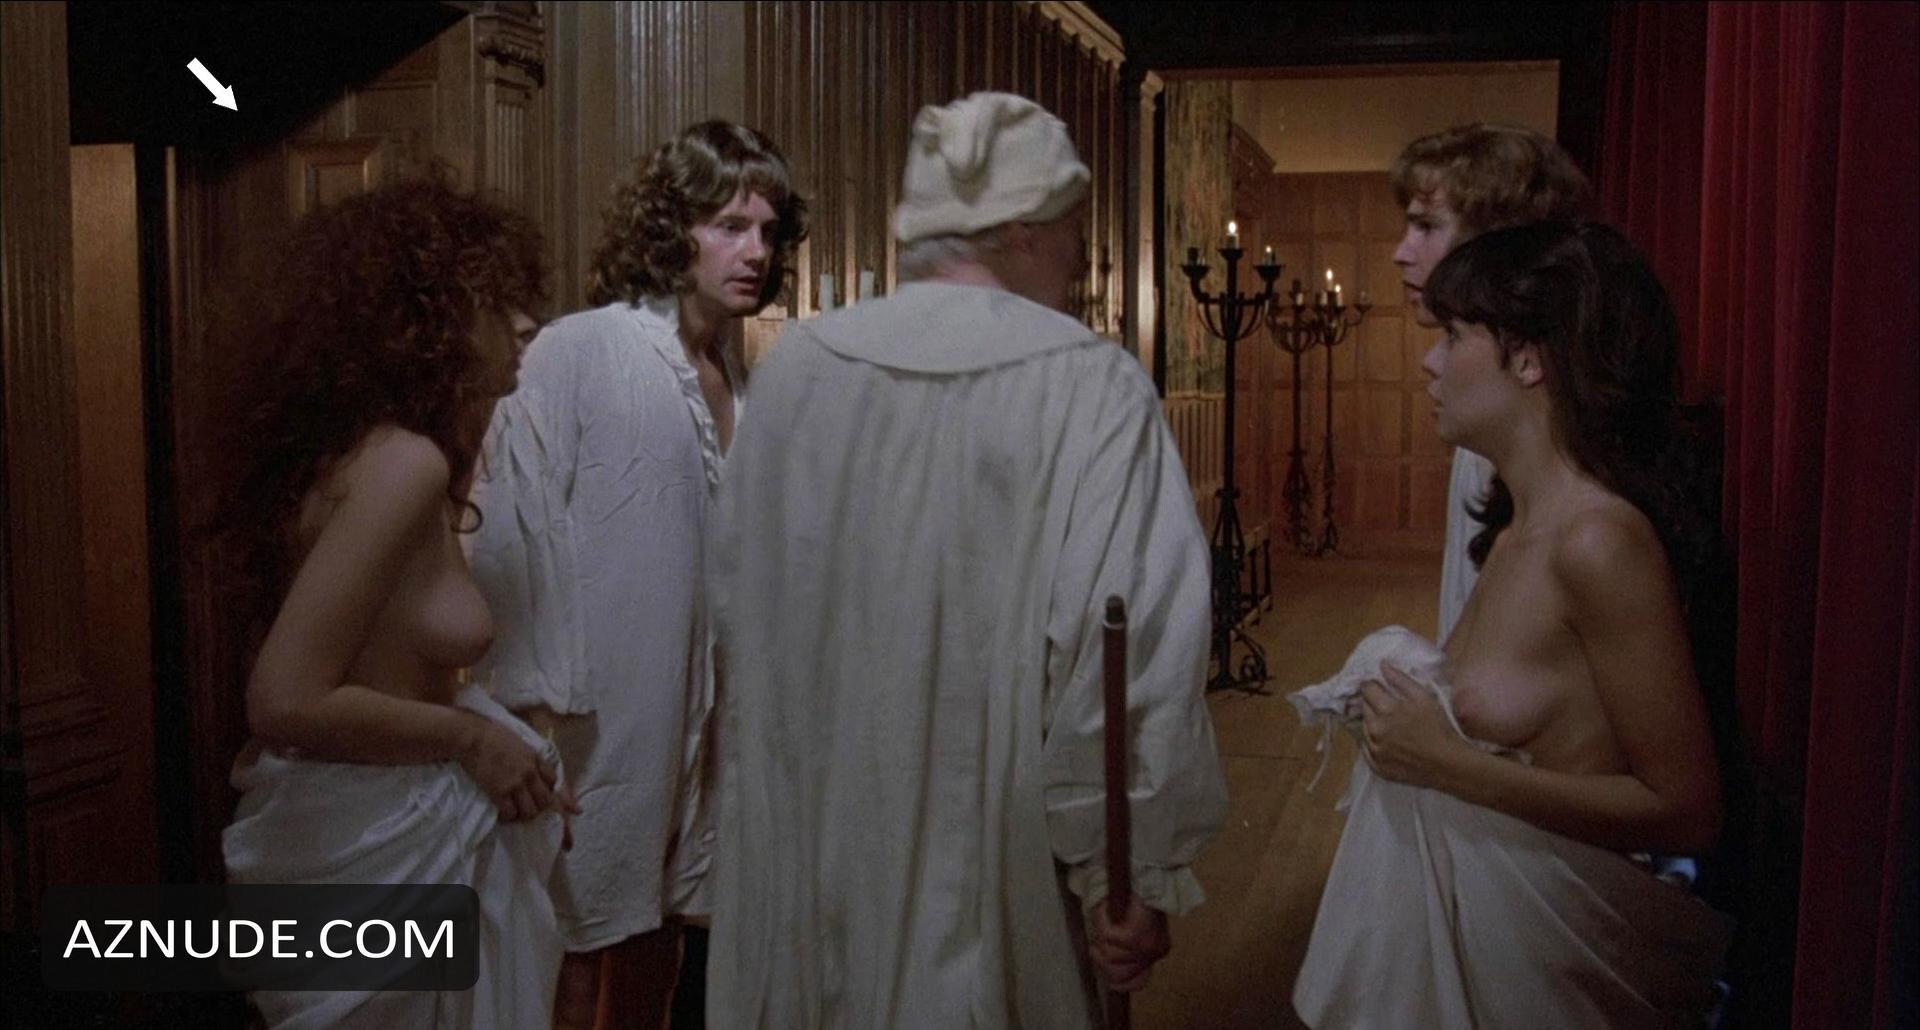 Cuentos eroticos ana belen emma cohen 1979